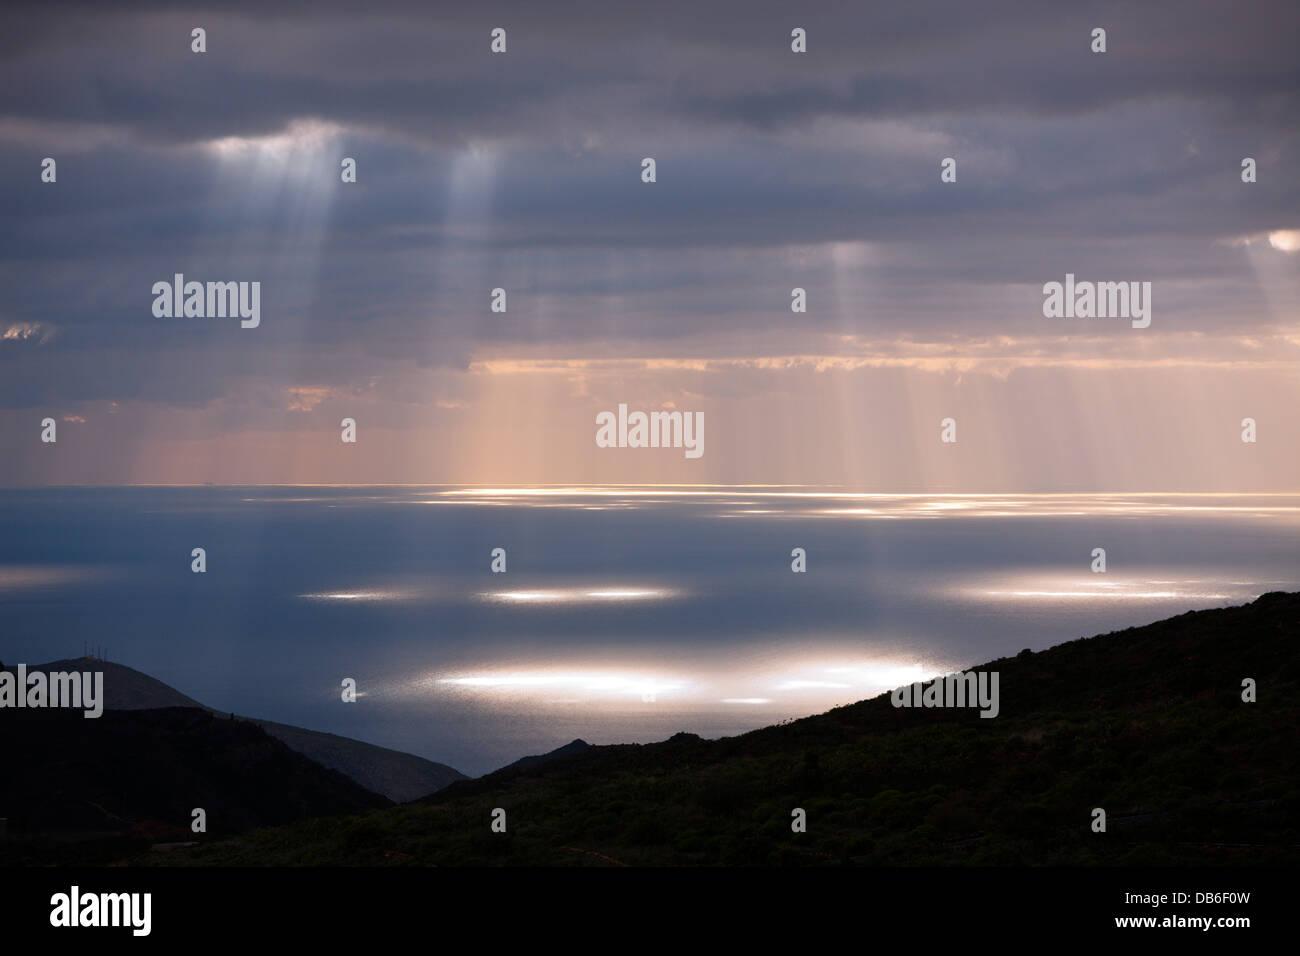 Sun Beams burst through Clouds, Tenerife, Canary Islands, Spain - Stock Image